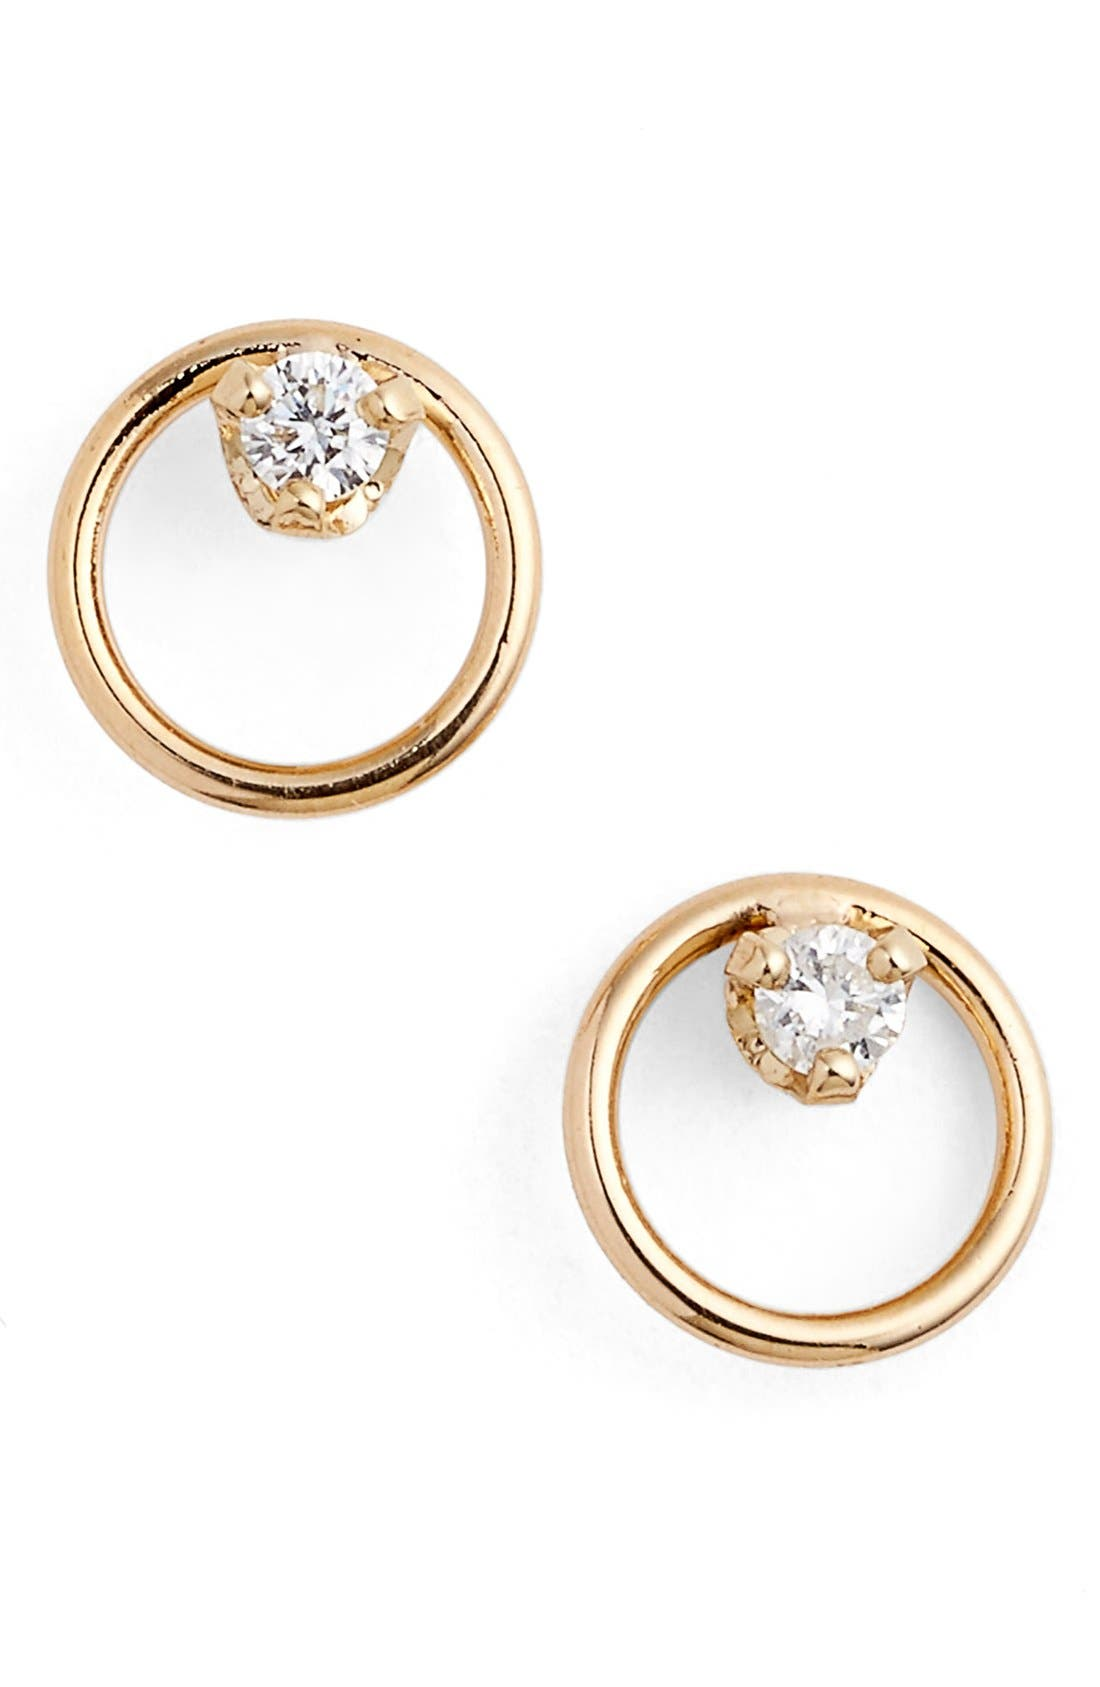 Diamond Circle Stud Earrings,                             Main thumbnail 1, color,                             Yellow Gold